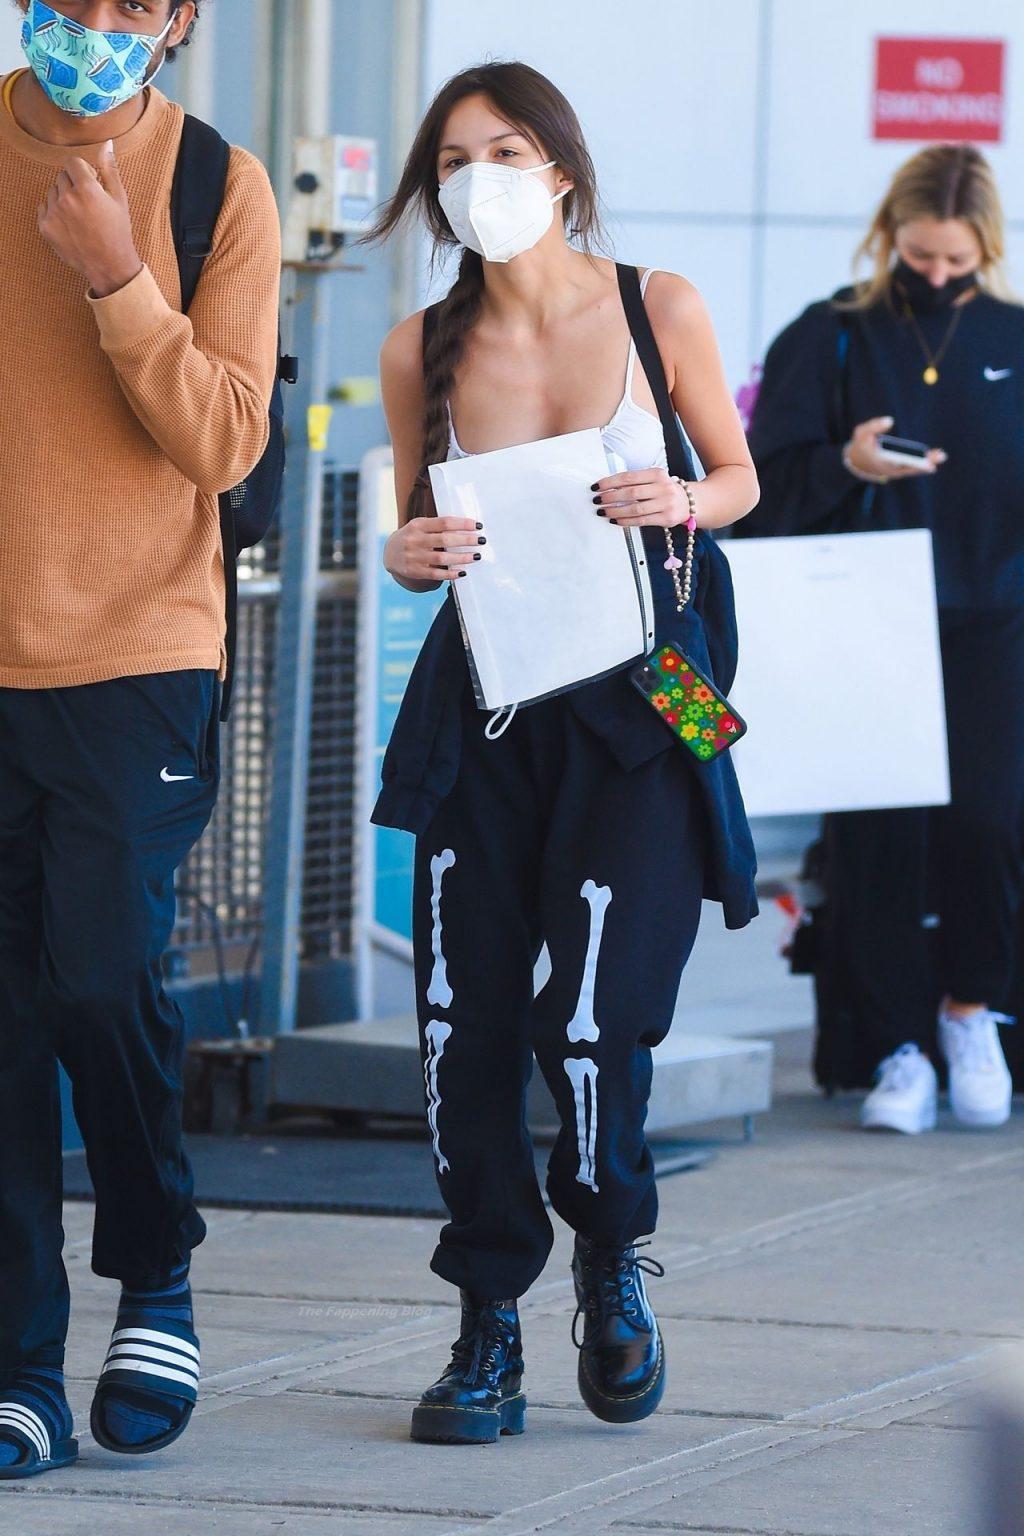 Olivia Rodrigo Arrives at JFK Airport in NYC Ahead of her SNL Performance (16 Photos)